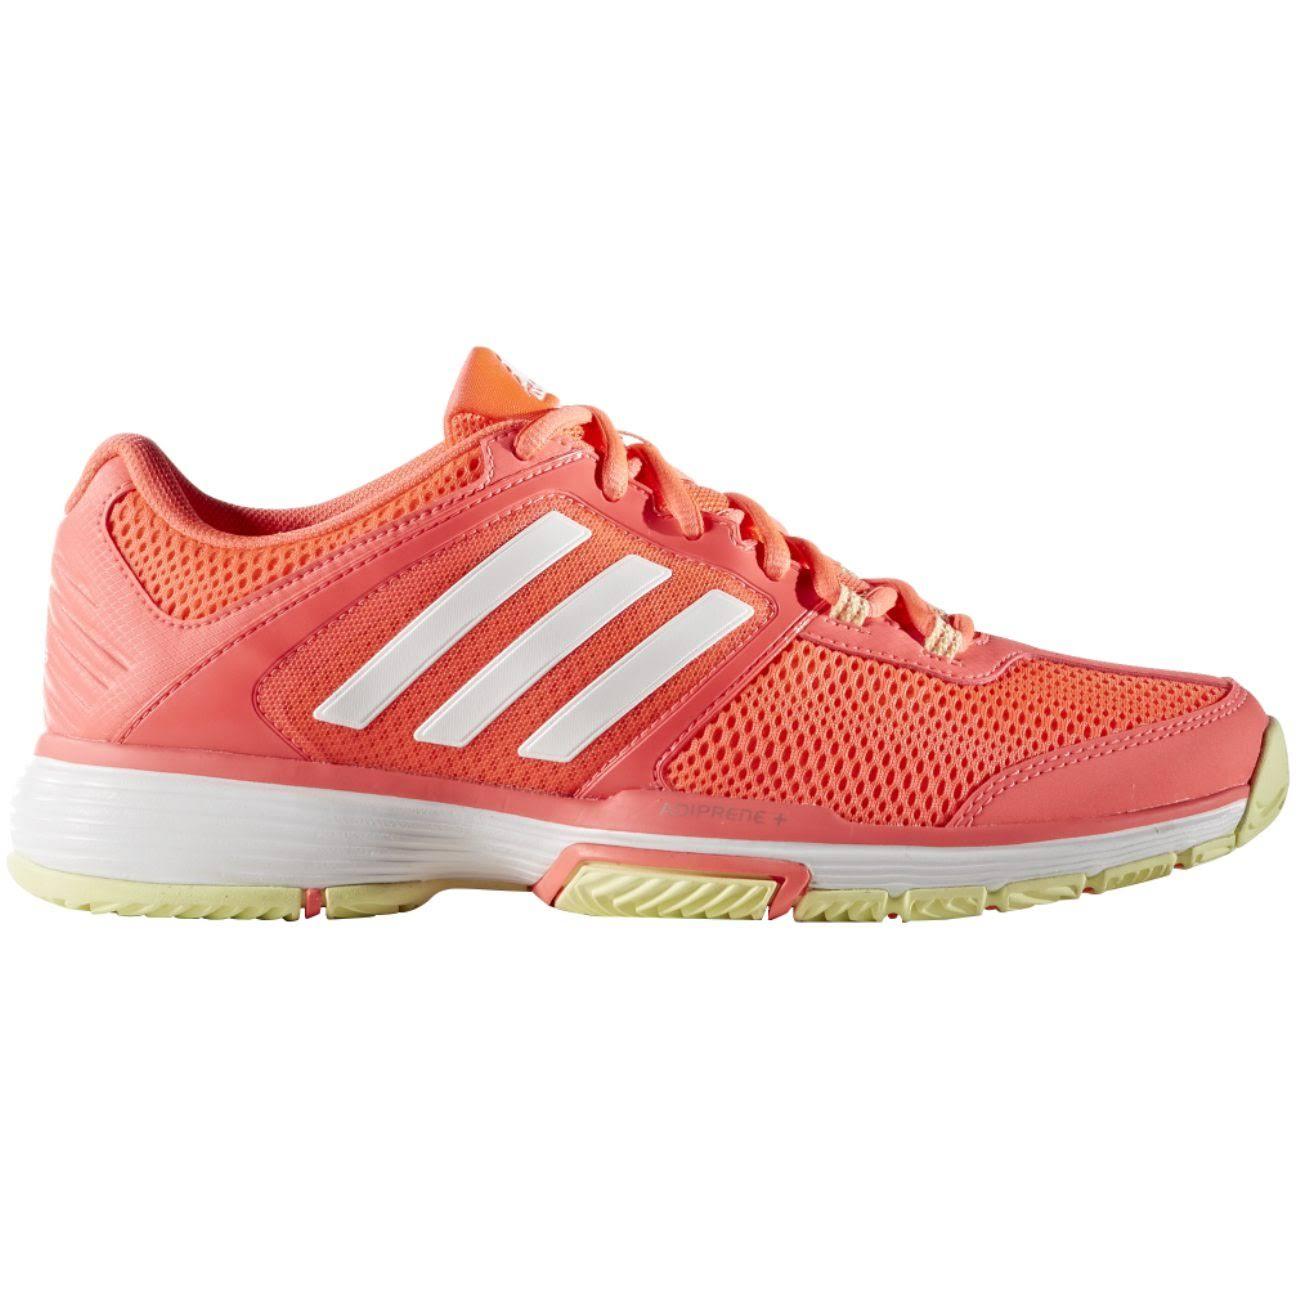 Pink Tennisschoenen 3 Barricade Adidas W Eu Dames Club 47 Blauw f6ybvY7g